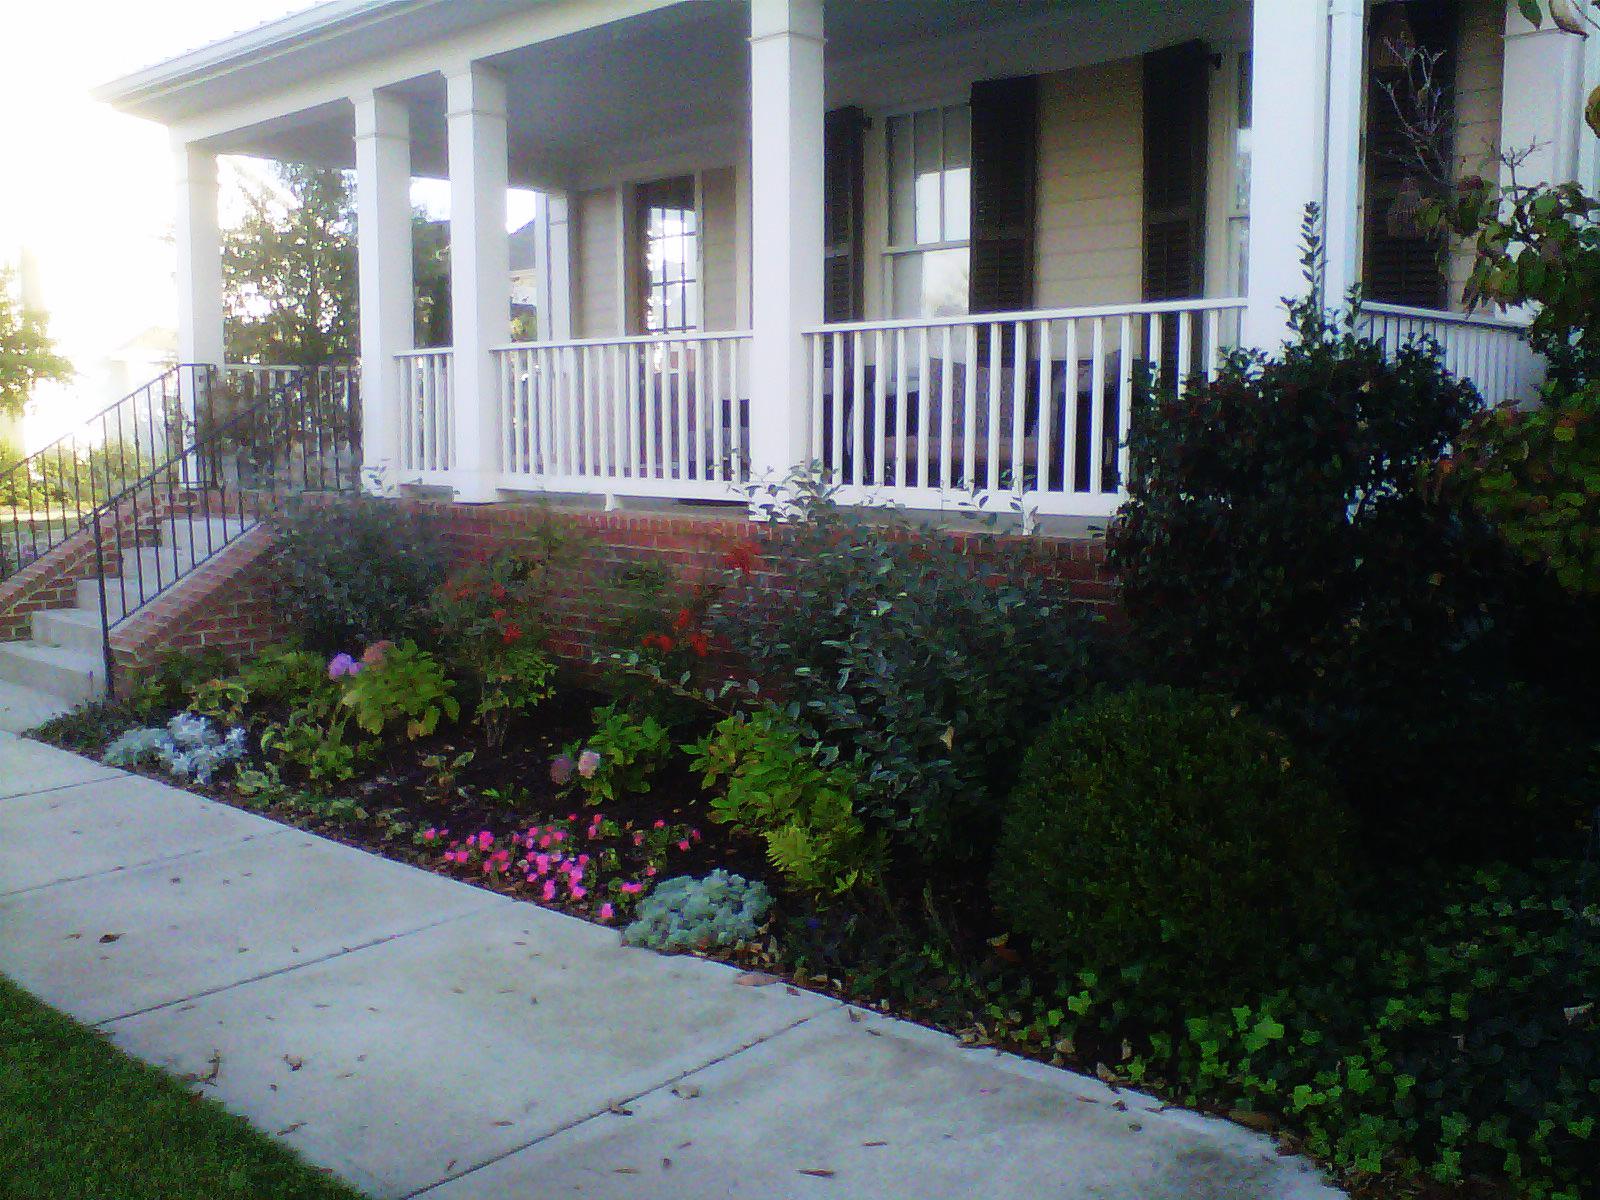 Justin Stelter Landscape Gardening - Modern Suburban Landscaping - 12591625545_21da5f044a_o.jpg